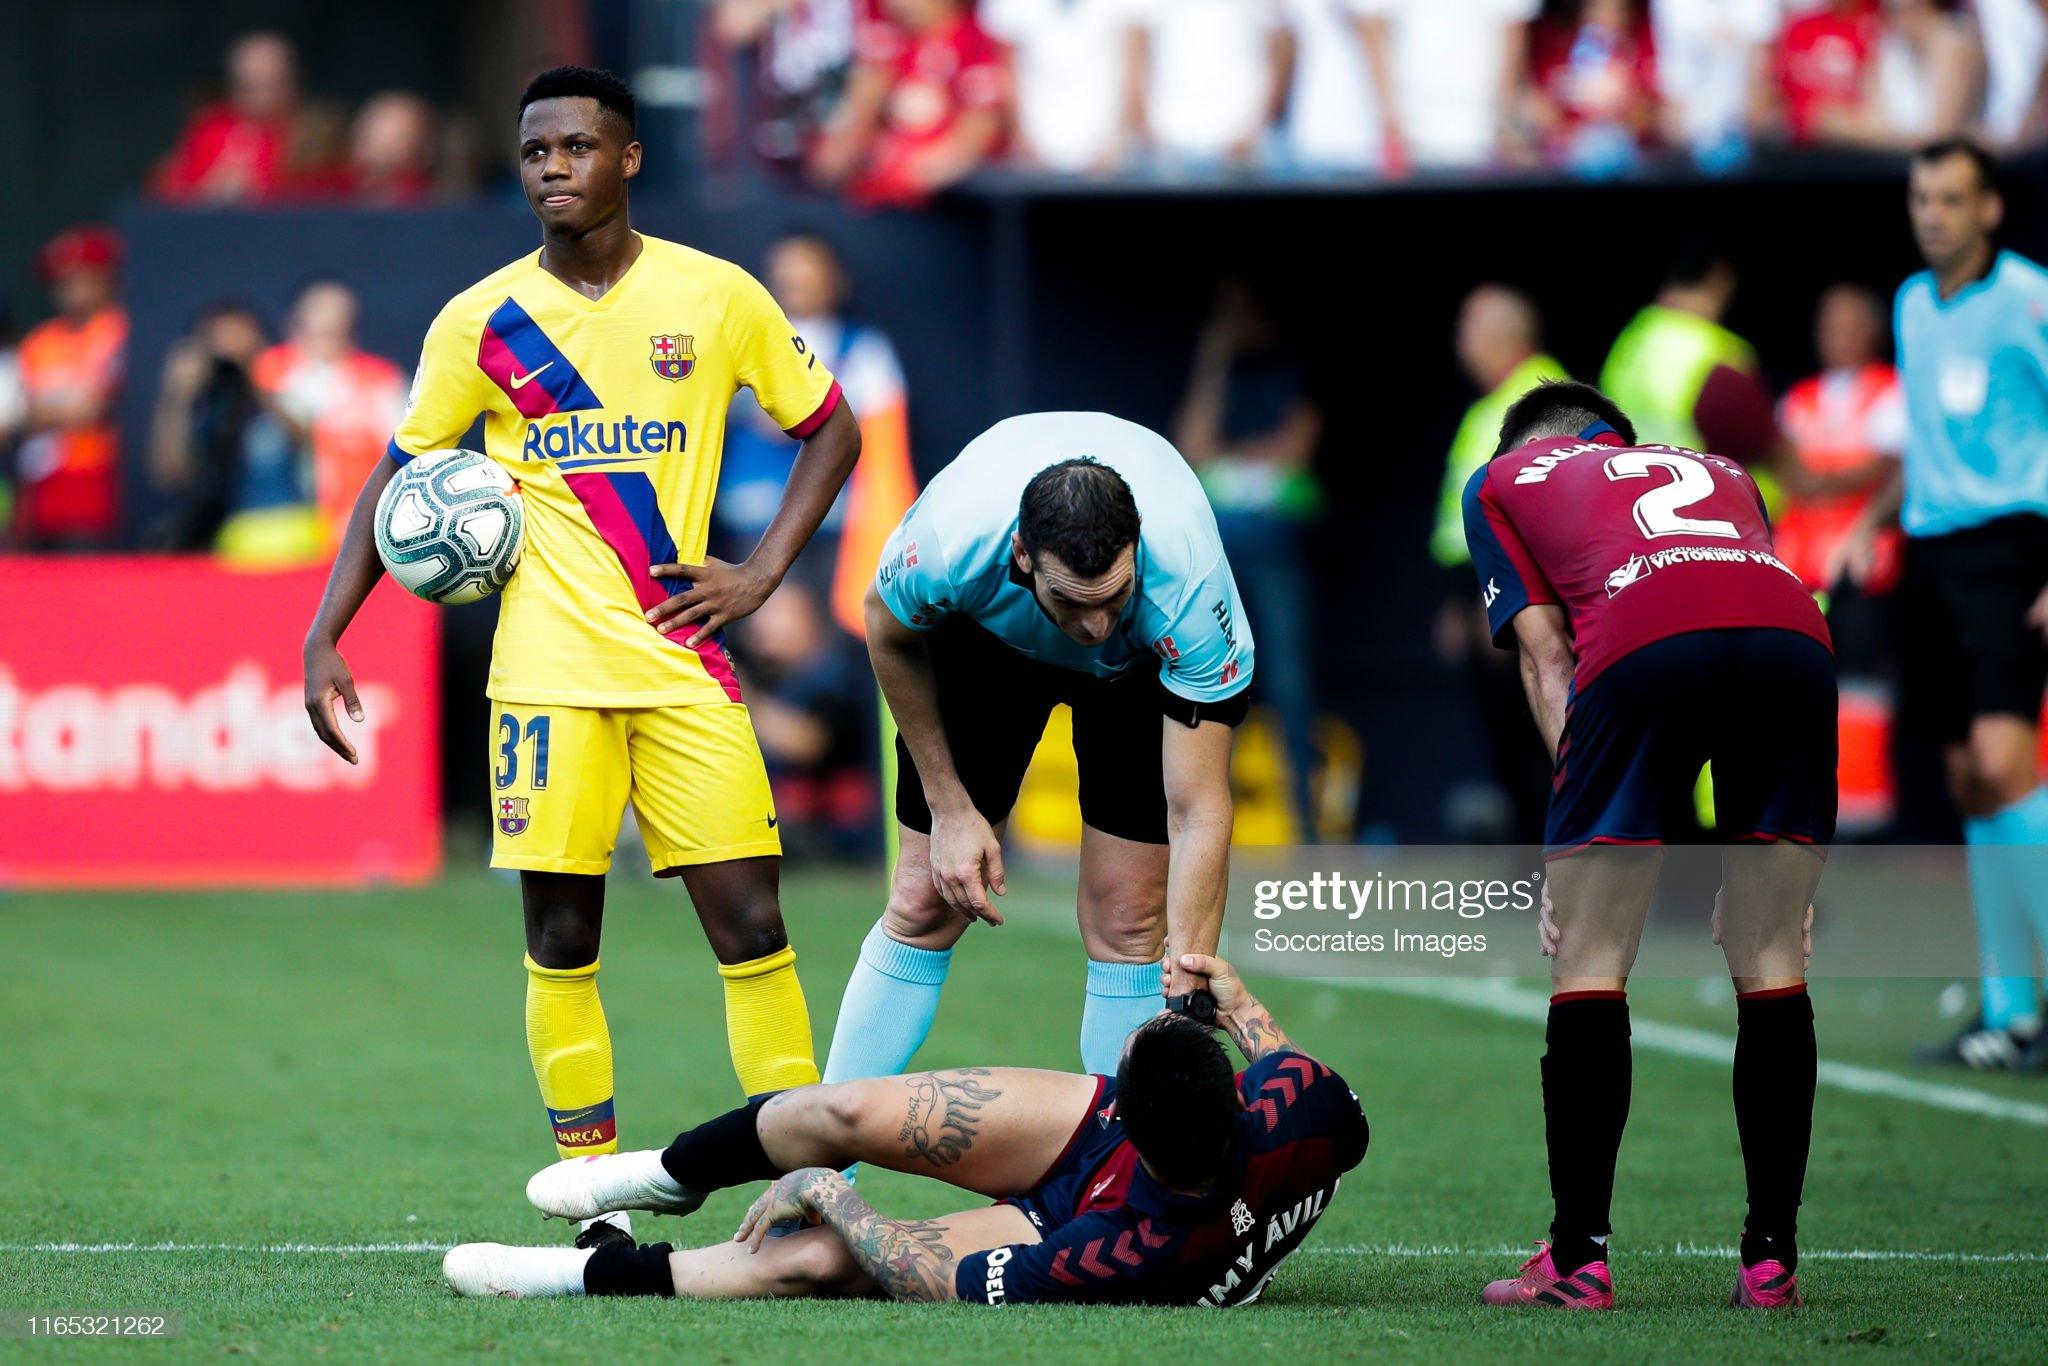 صور مباراة : أوساسونا - برشلونة 2-2 ( 31-08-2019 )  Ansu-fati-of-fc-barcelona-chimy-avila-of-ca-osasuna-referee-martinez-picture-id1165321262?s=2048x2048